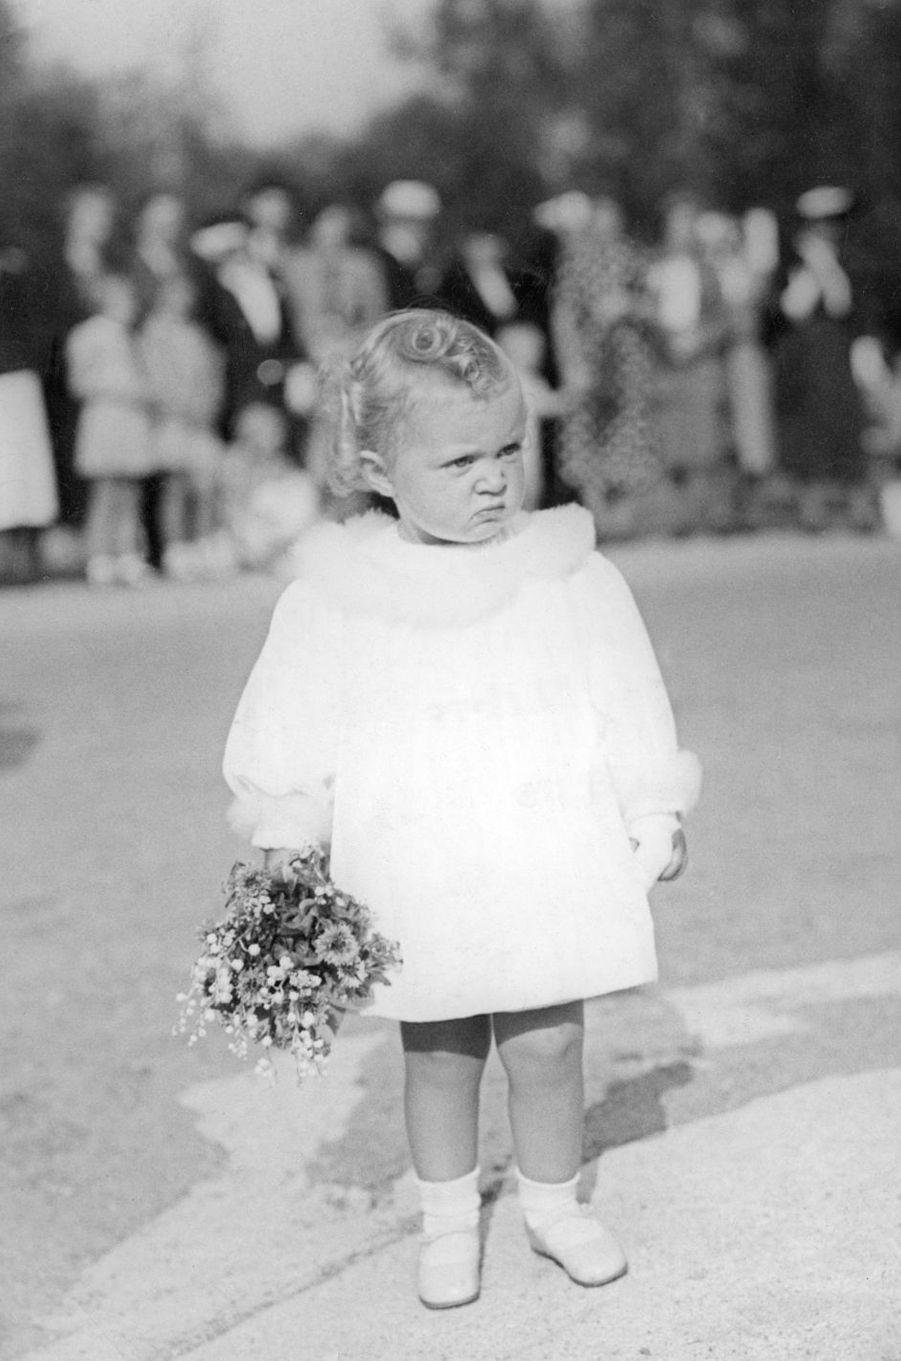 La princesse Birgitta de Suède, le 3 septembre 1938